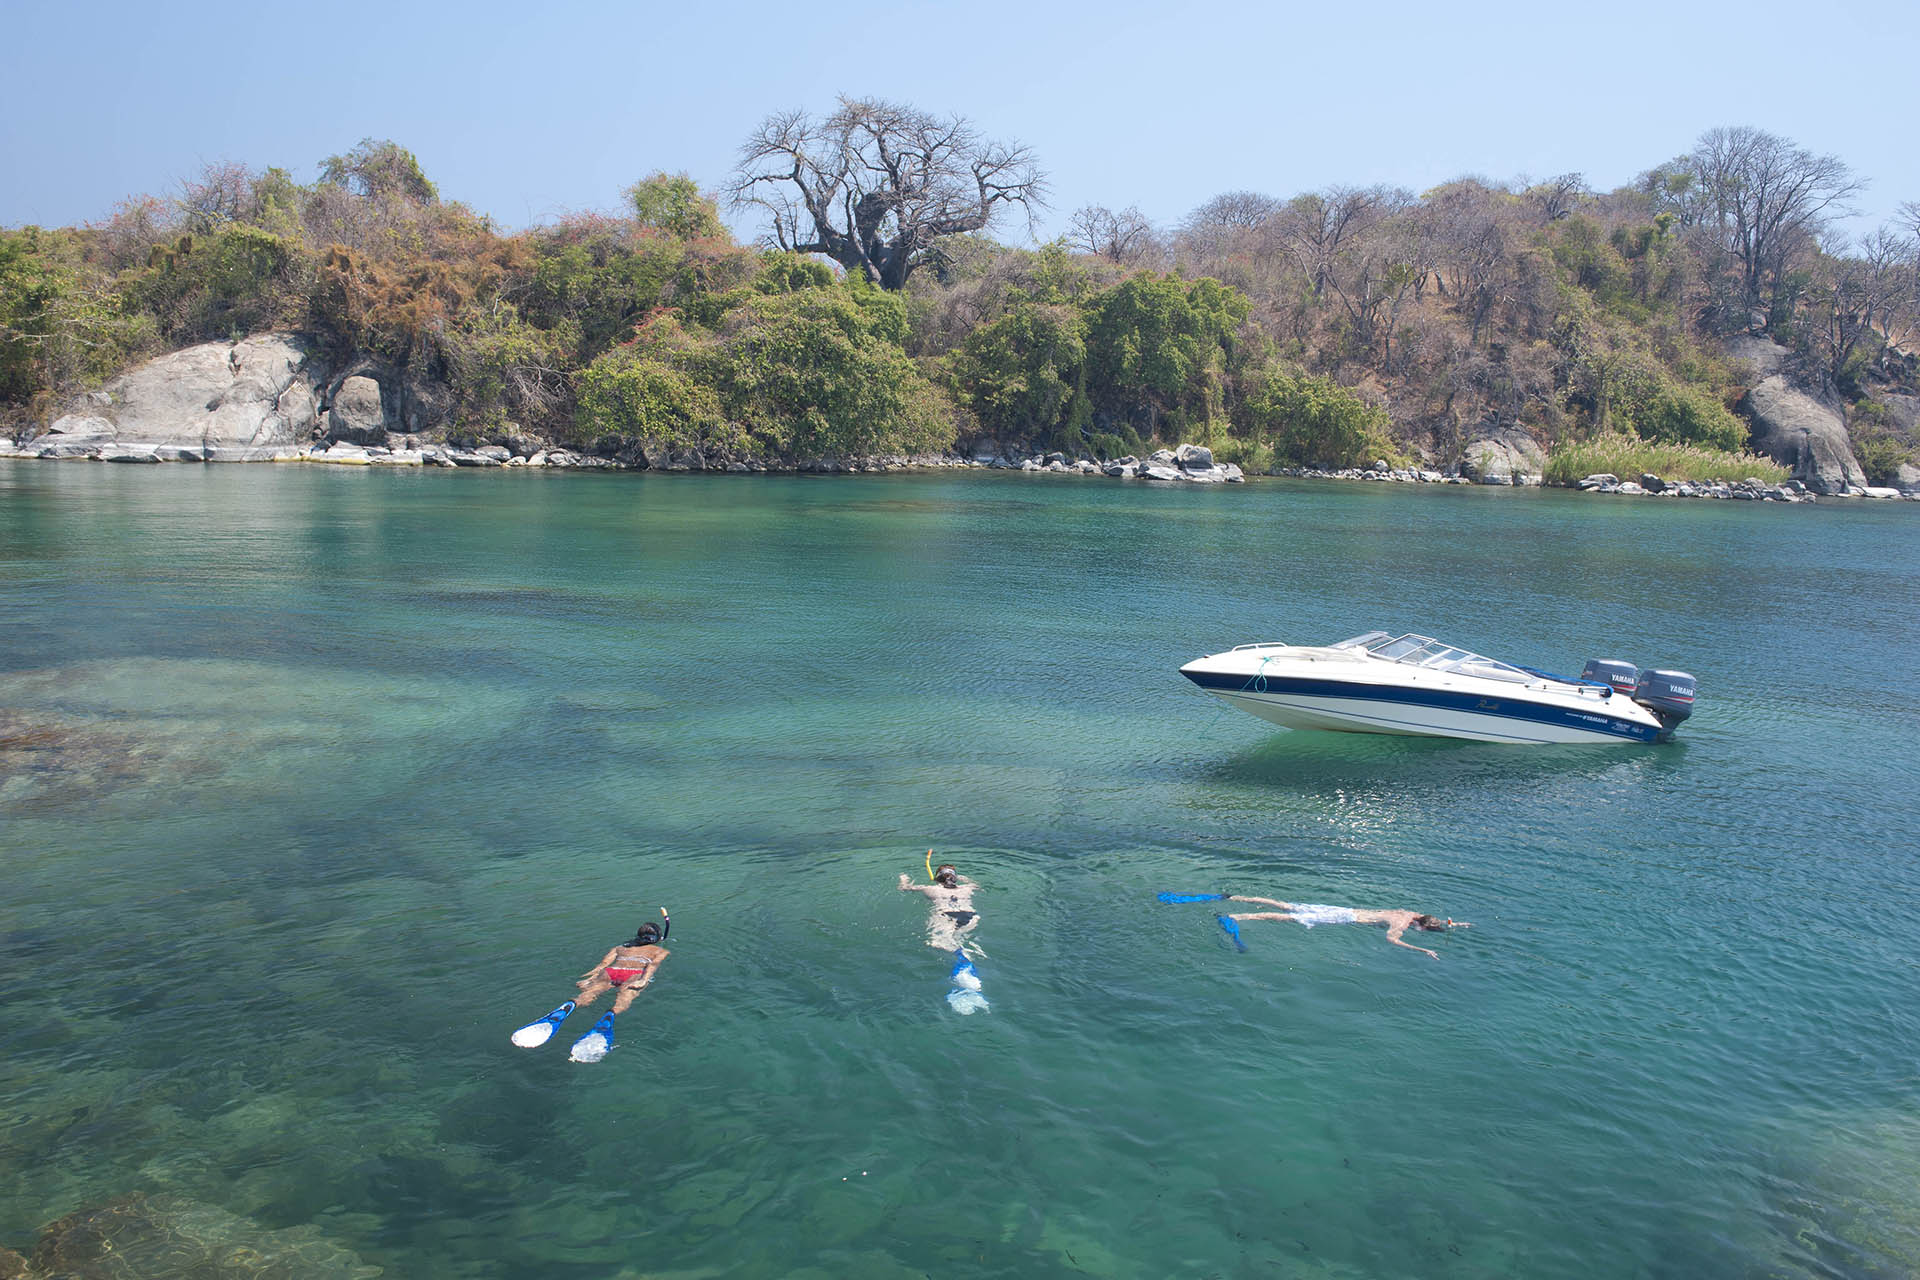 malawi zambia wet-wild-south-luangwa-lake-malawi-11-nights-tours-malawian-style-malawi-adventures-experiences-specialist-tour-operator-swimming-pumulani